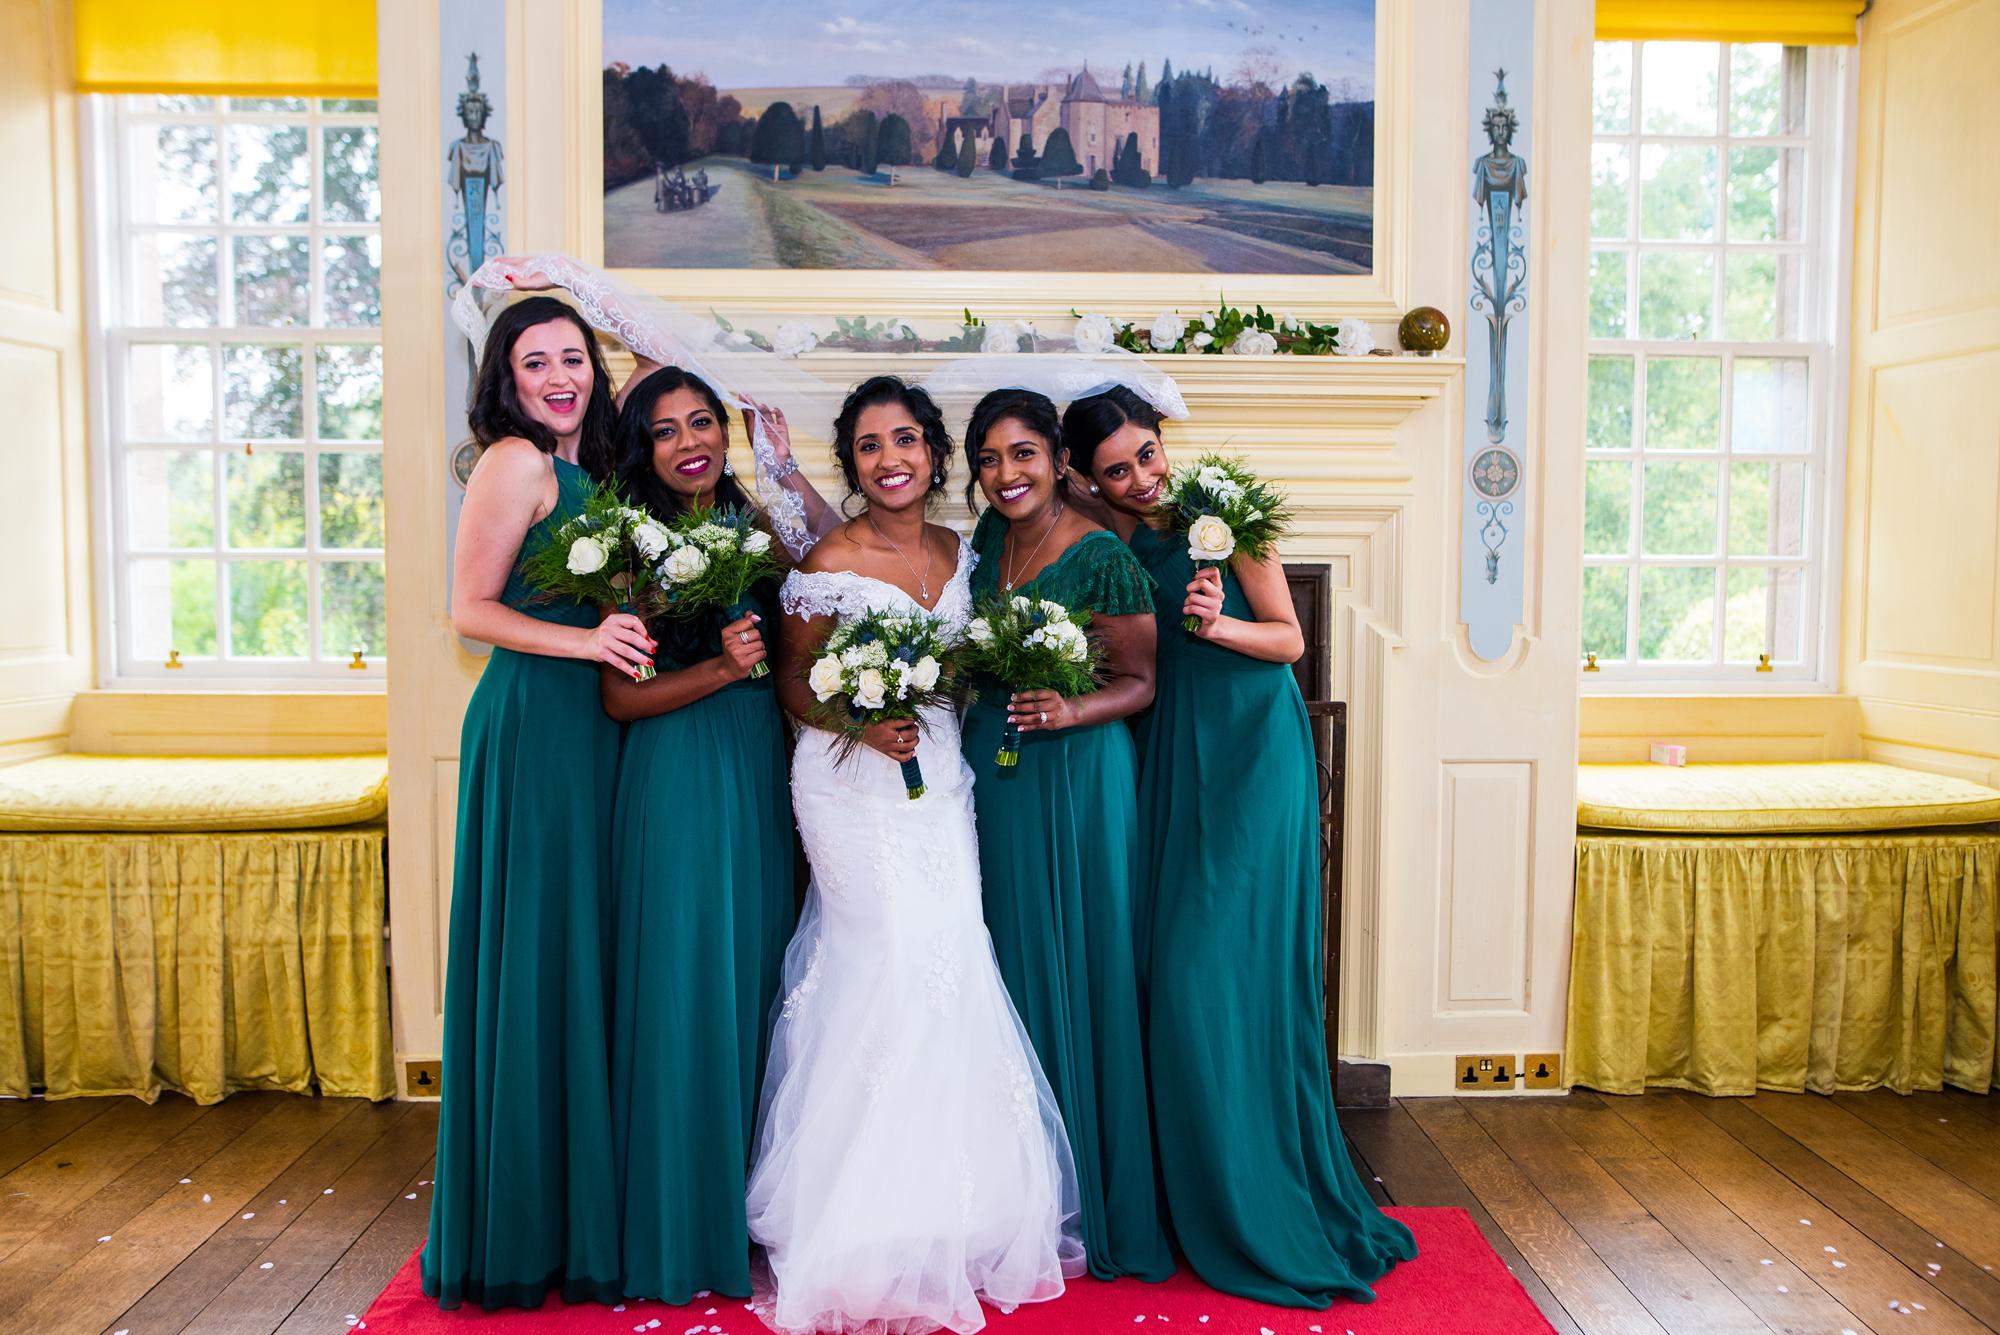 Kev and Shrabani wedding photos (176 of 350).jpg